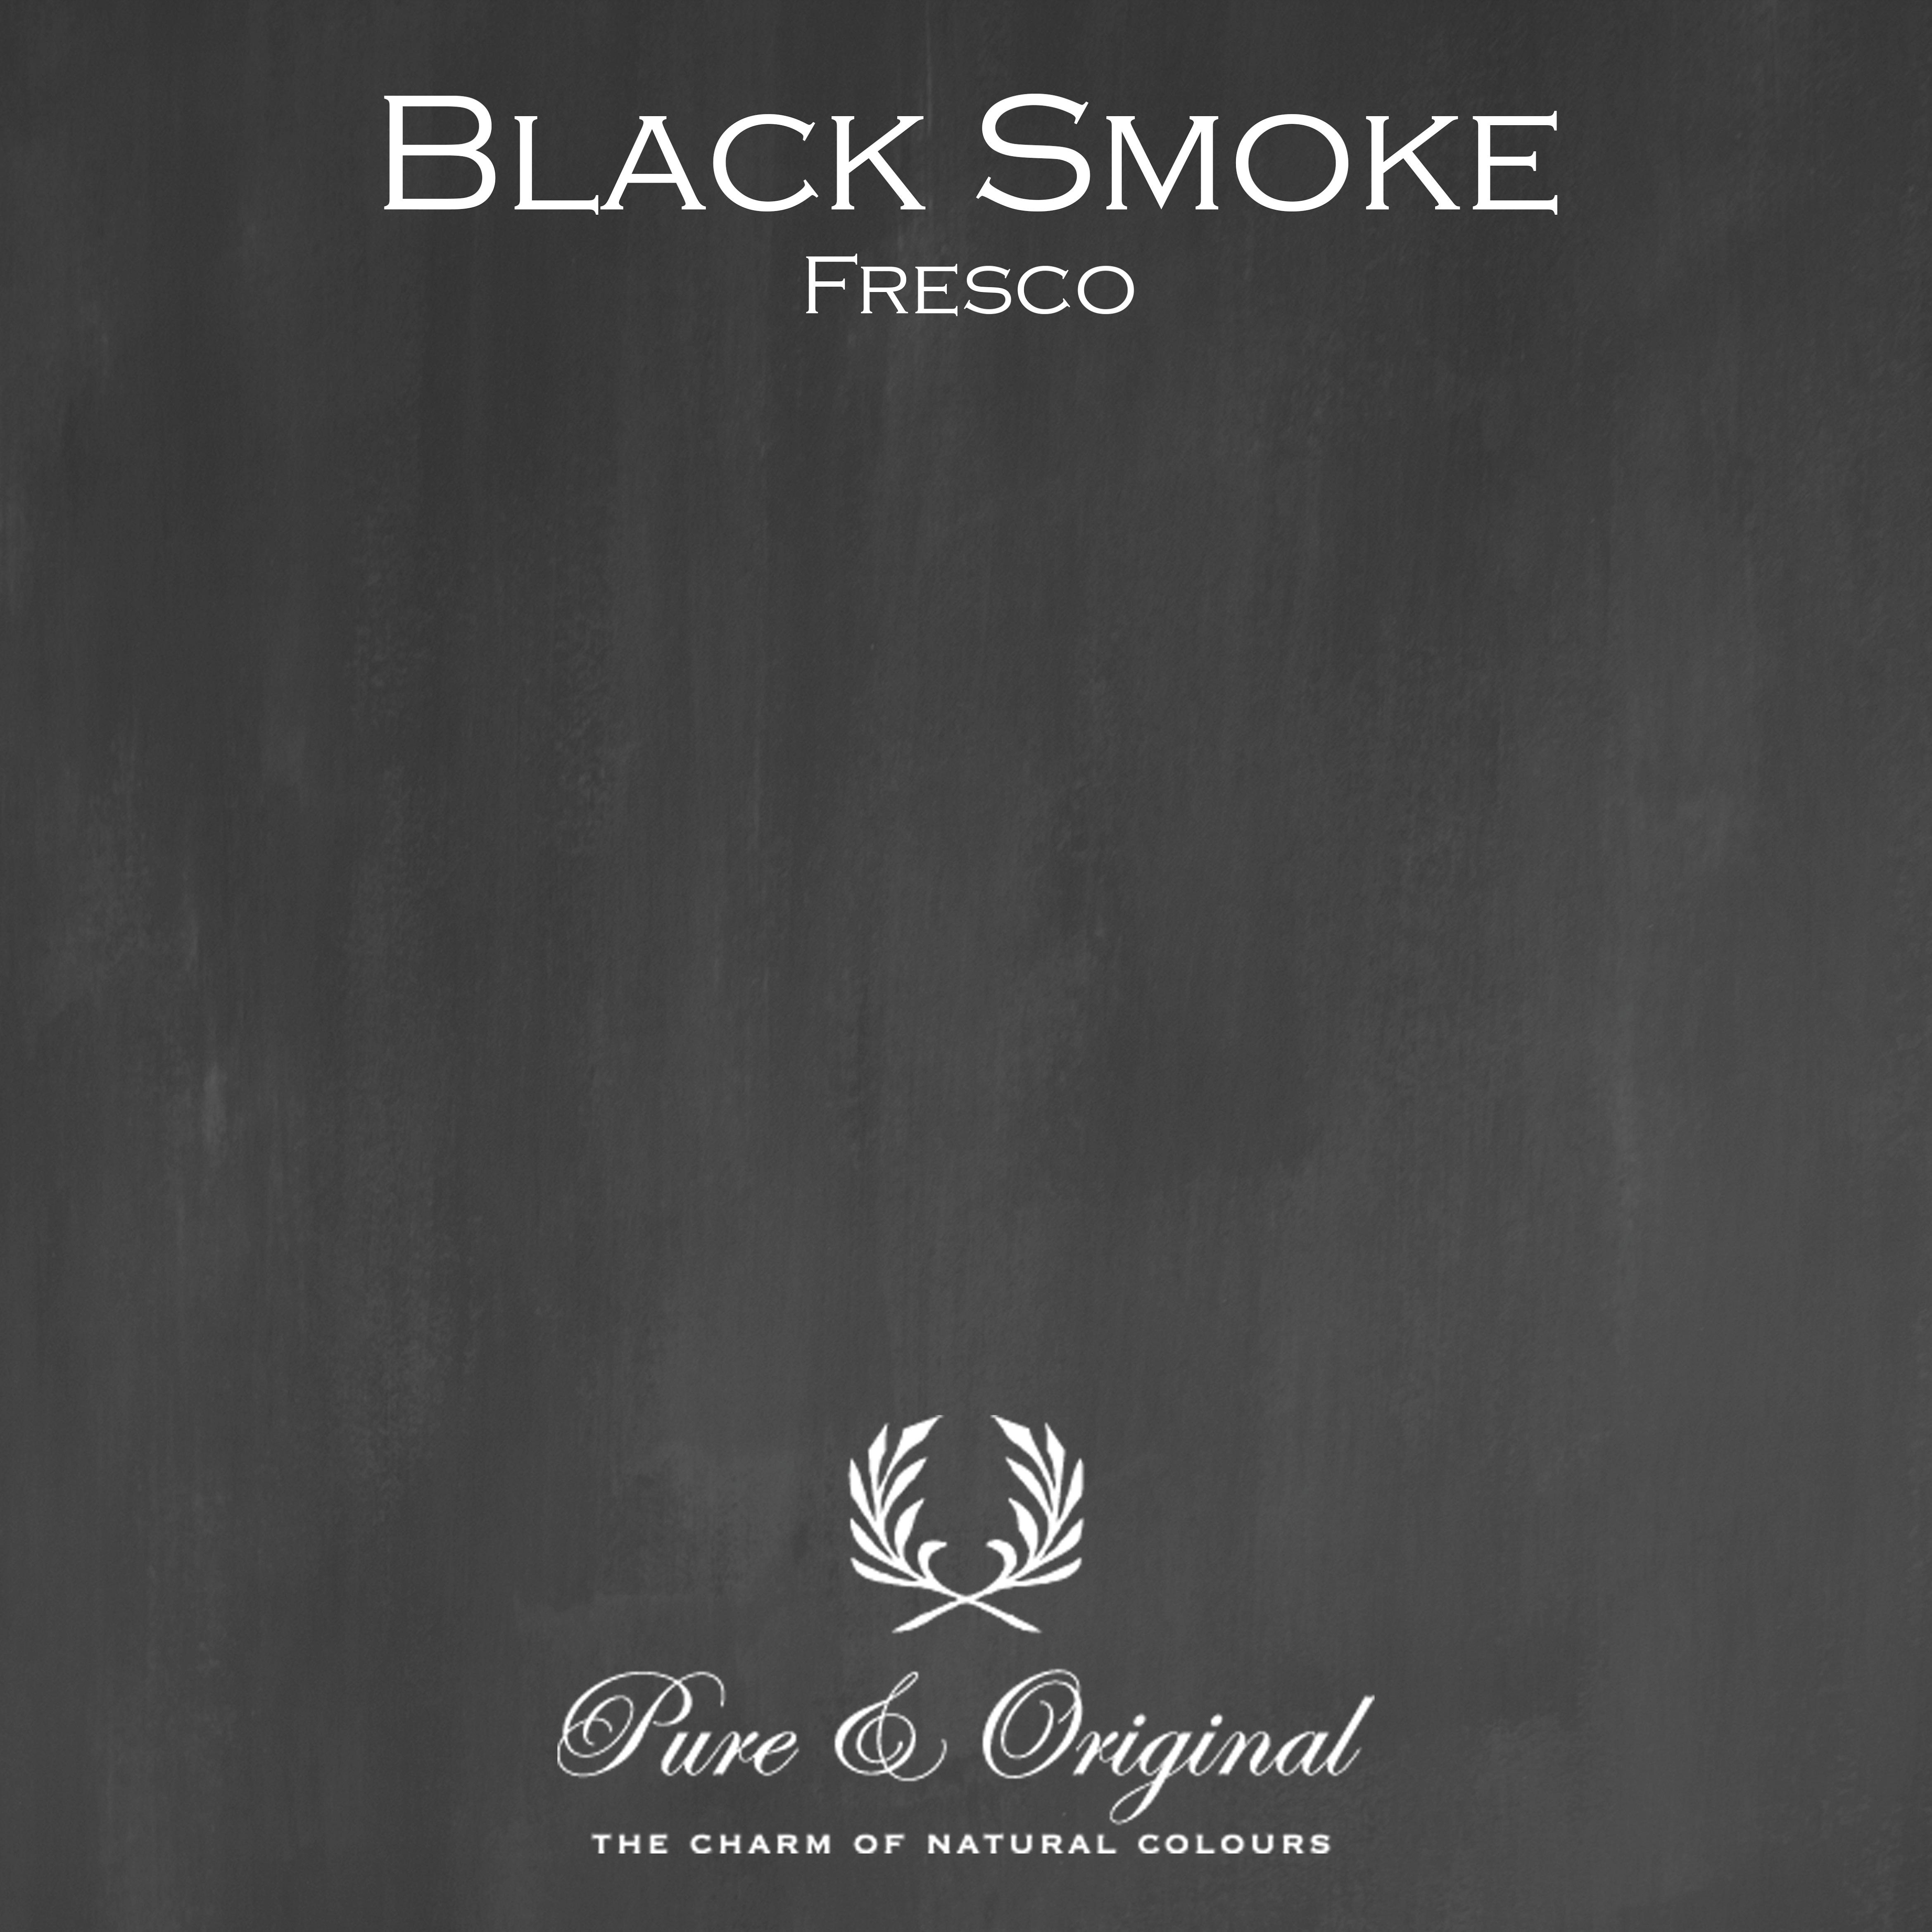 Kulör Black Smoke, Fresco  kalkfärg